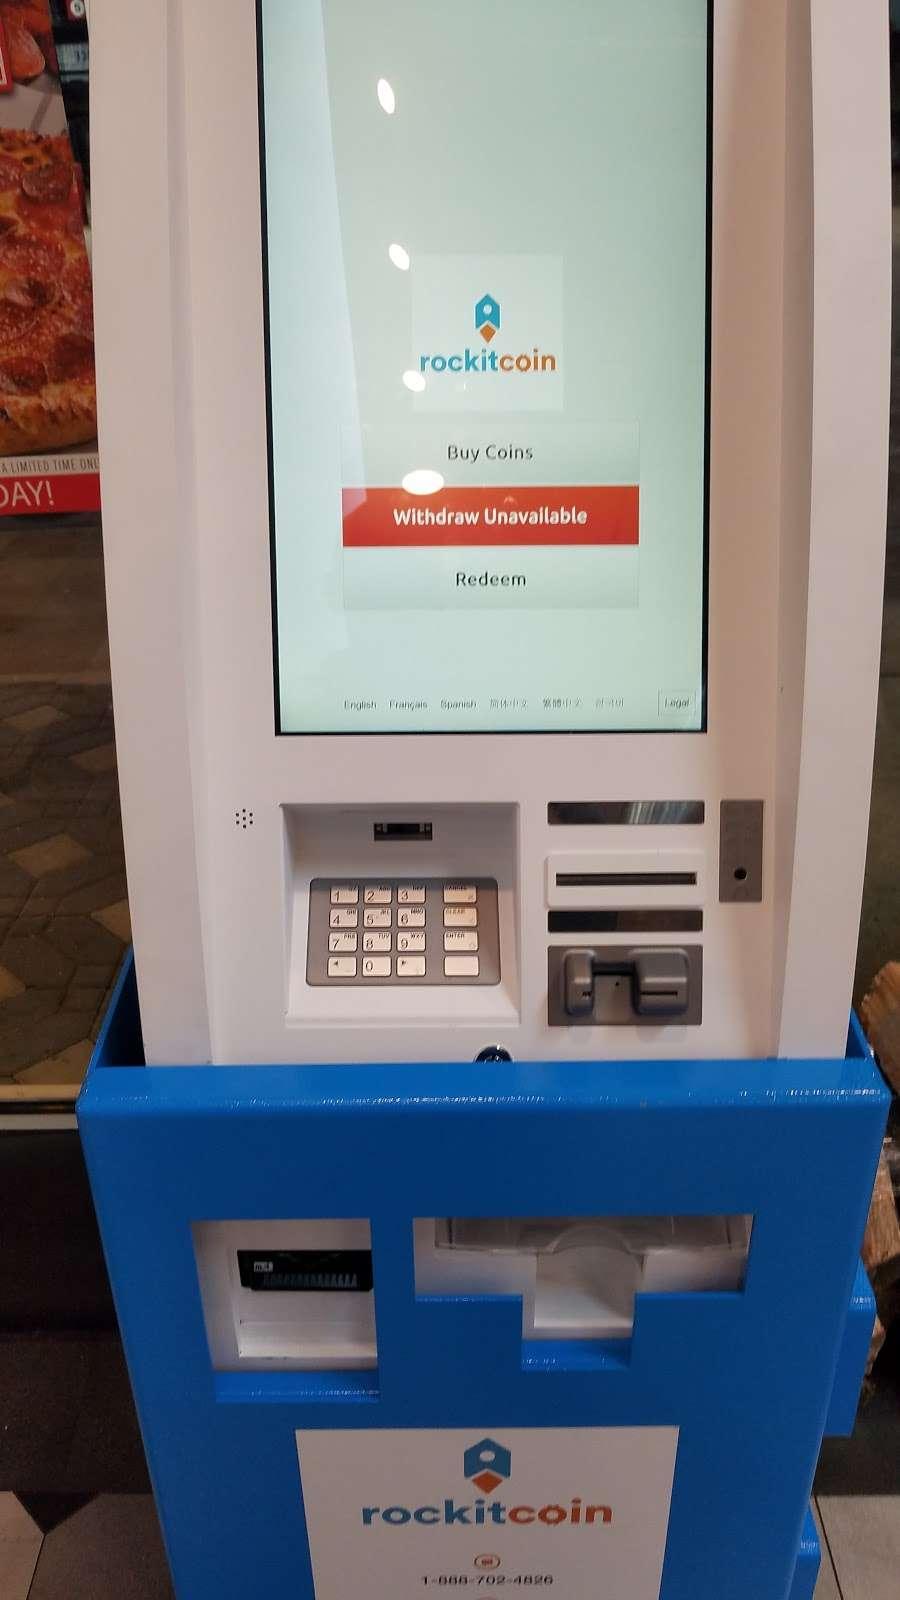 RockItCoin Bitcoin ATM - atm  | Photo 2 of 4 | Address: 455 Hollow Tree Ln, Houston, TX 77090, USA | Phone: (888) 702-4826